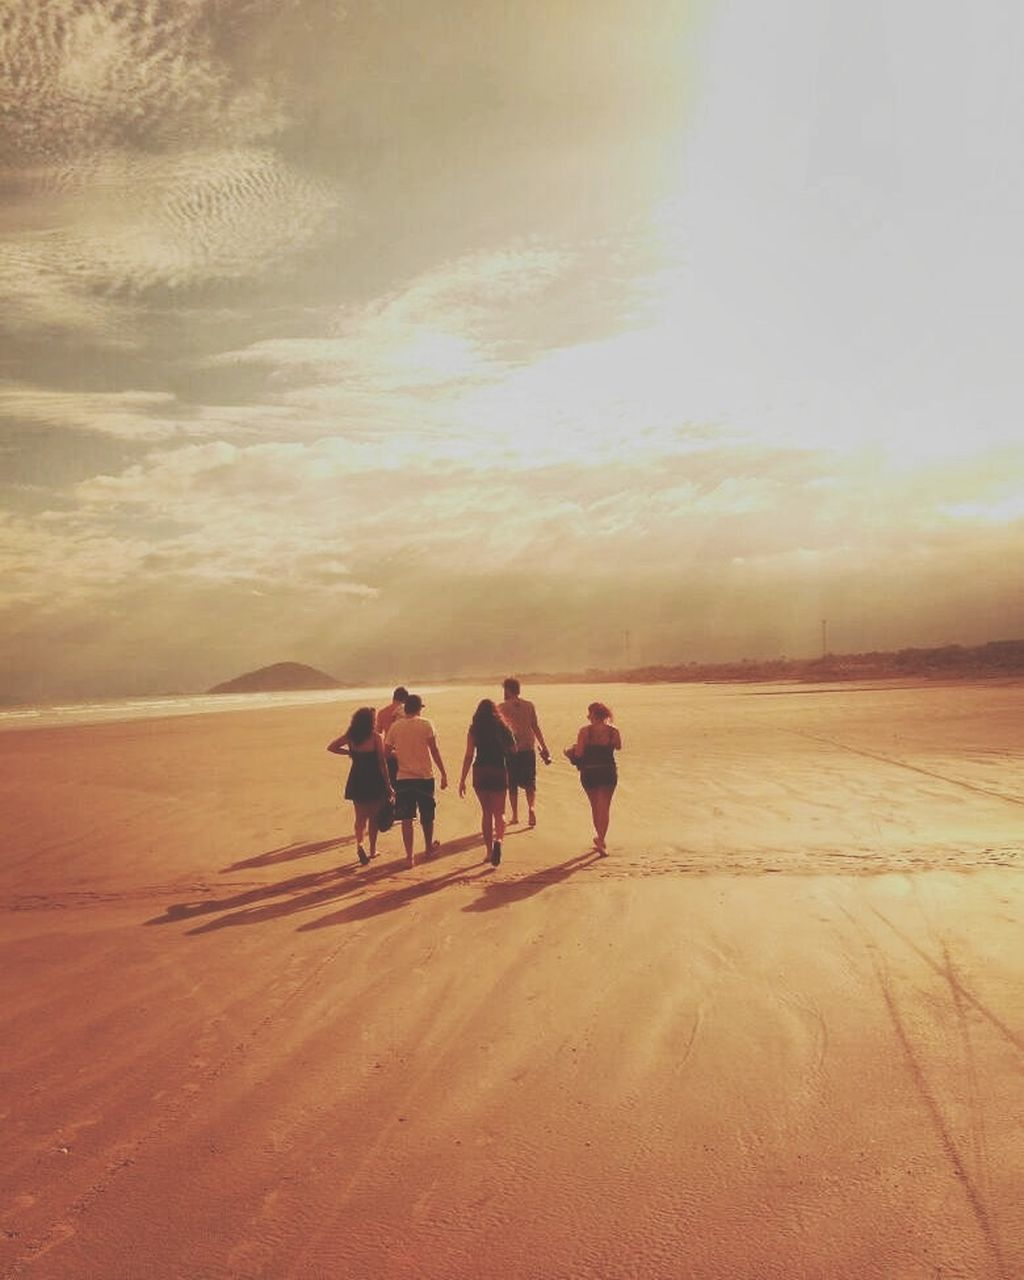 desert, sand, nature, landscape, horseback riding, domestic animals, outdoors, sunset, men, beauty in nature, sky, sand dune, day, mammal, adult, people